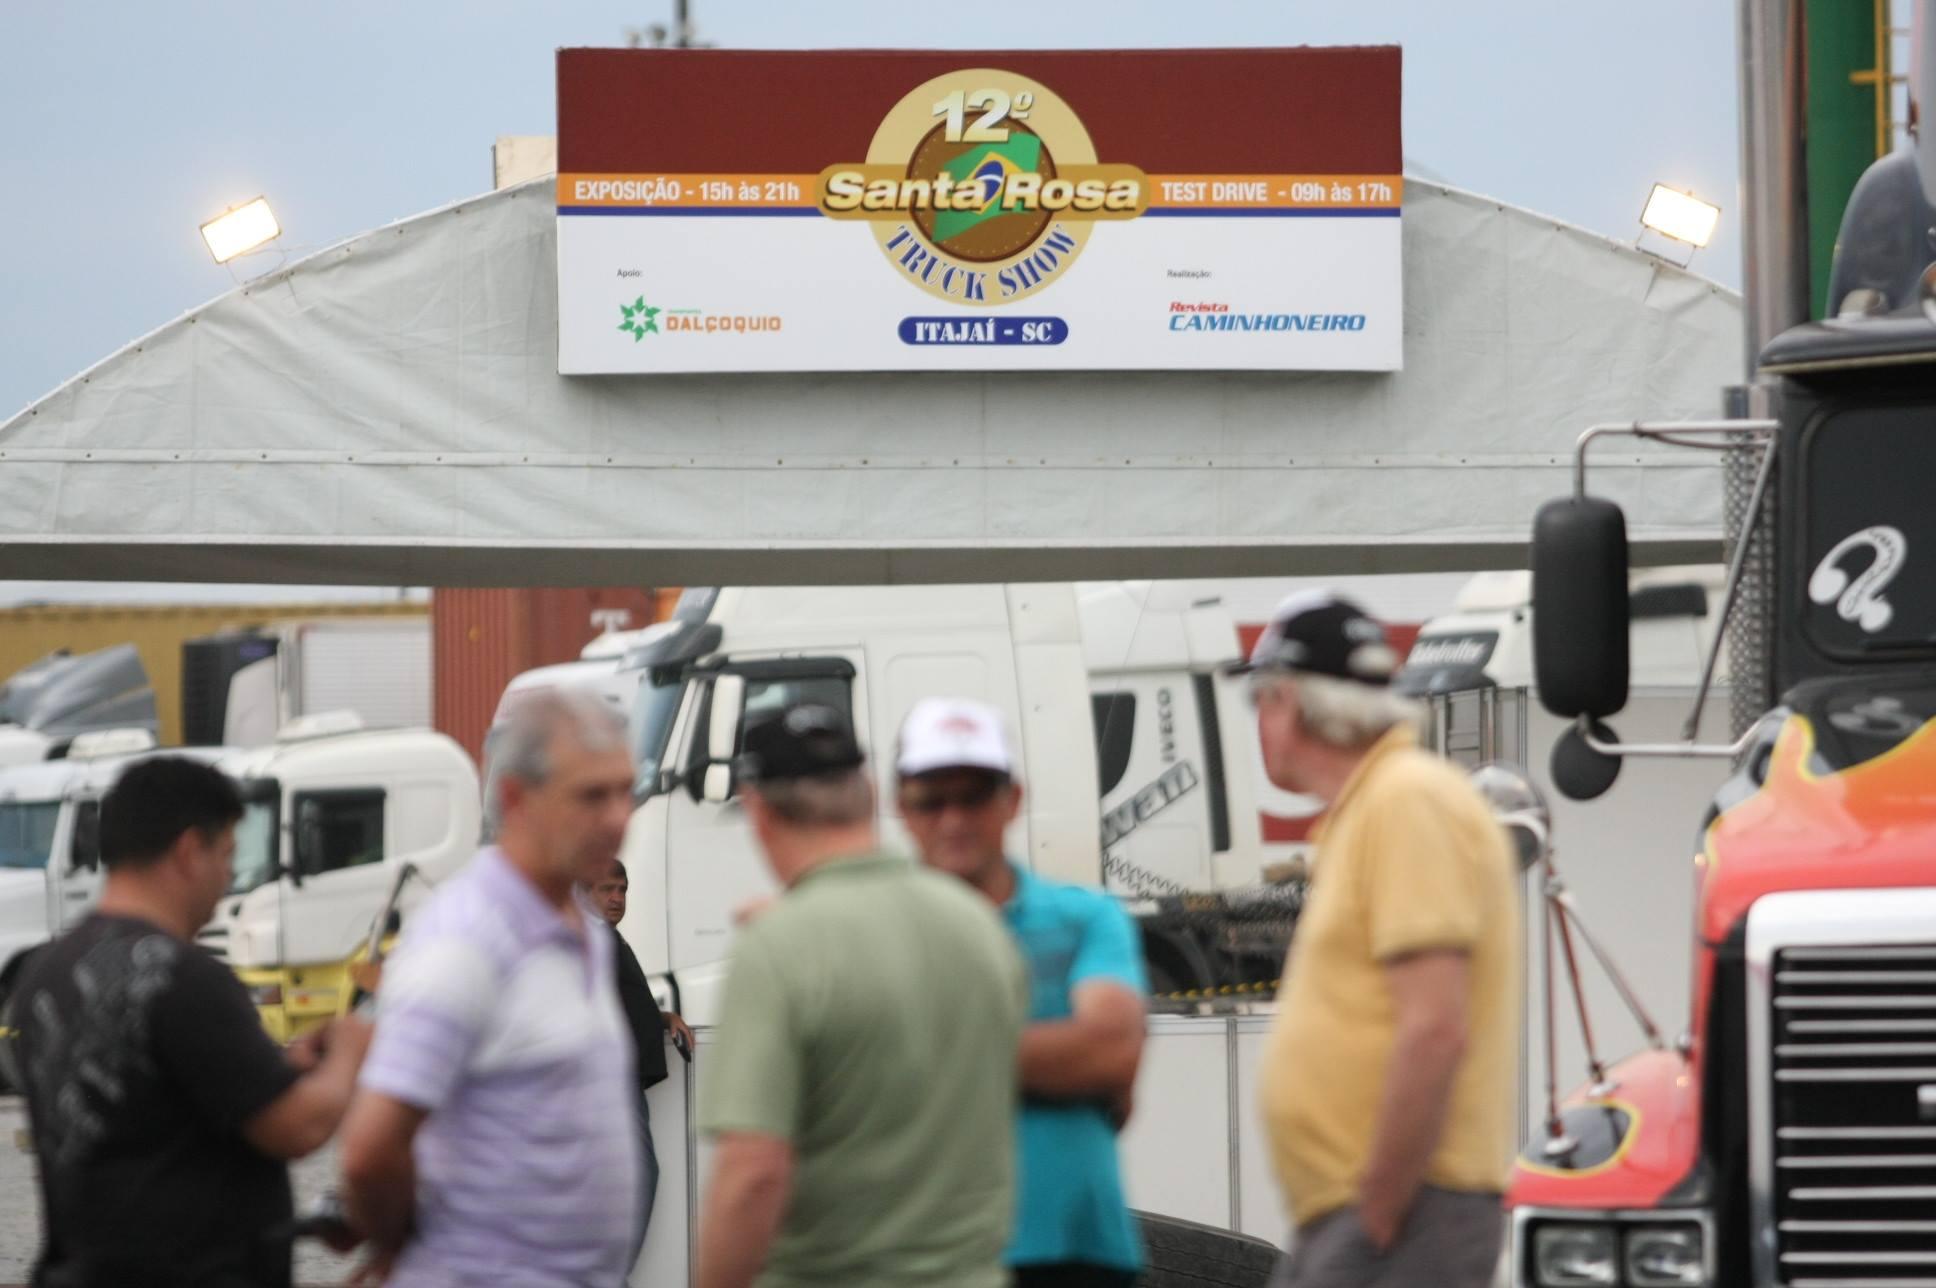 12º Santa Rosa Truck Show – Itajai / SC